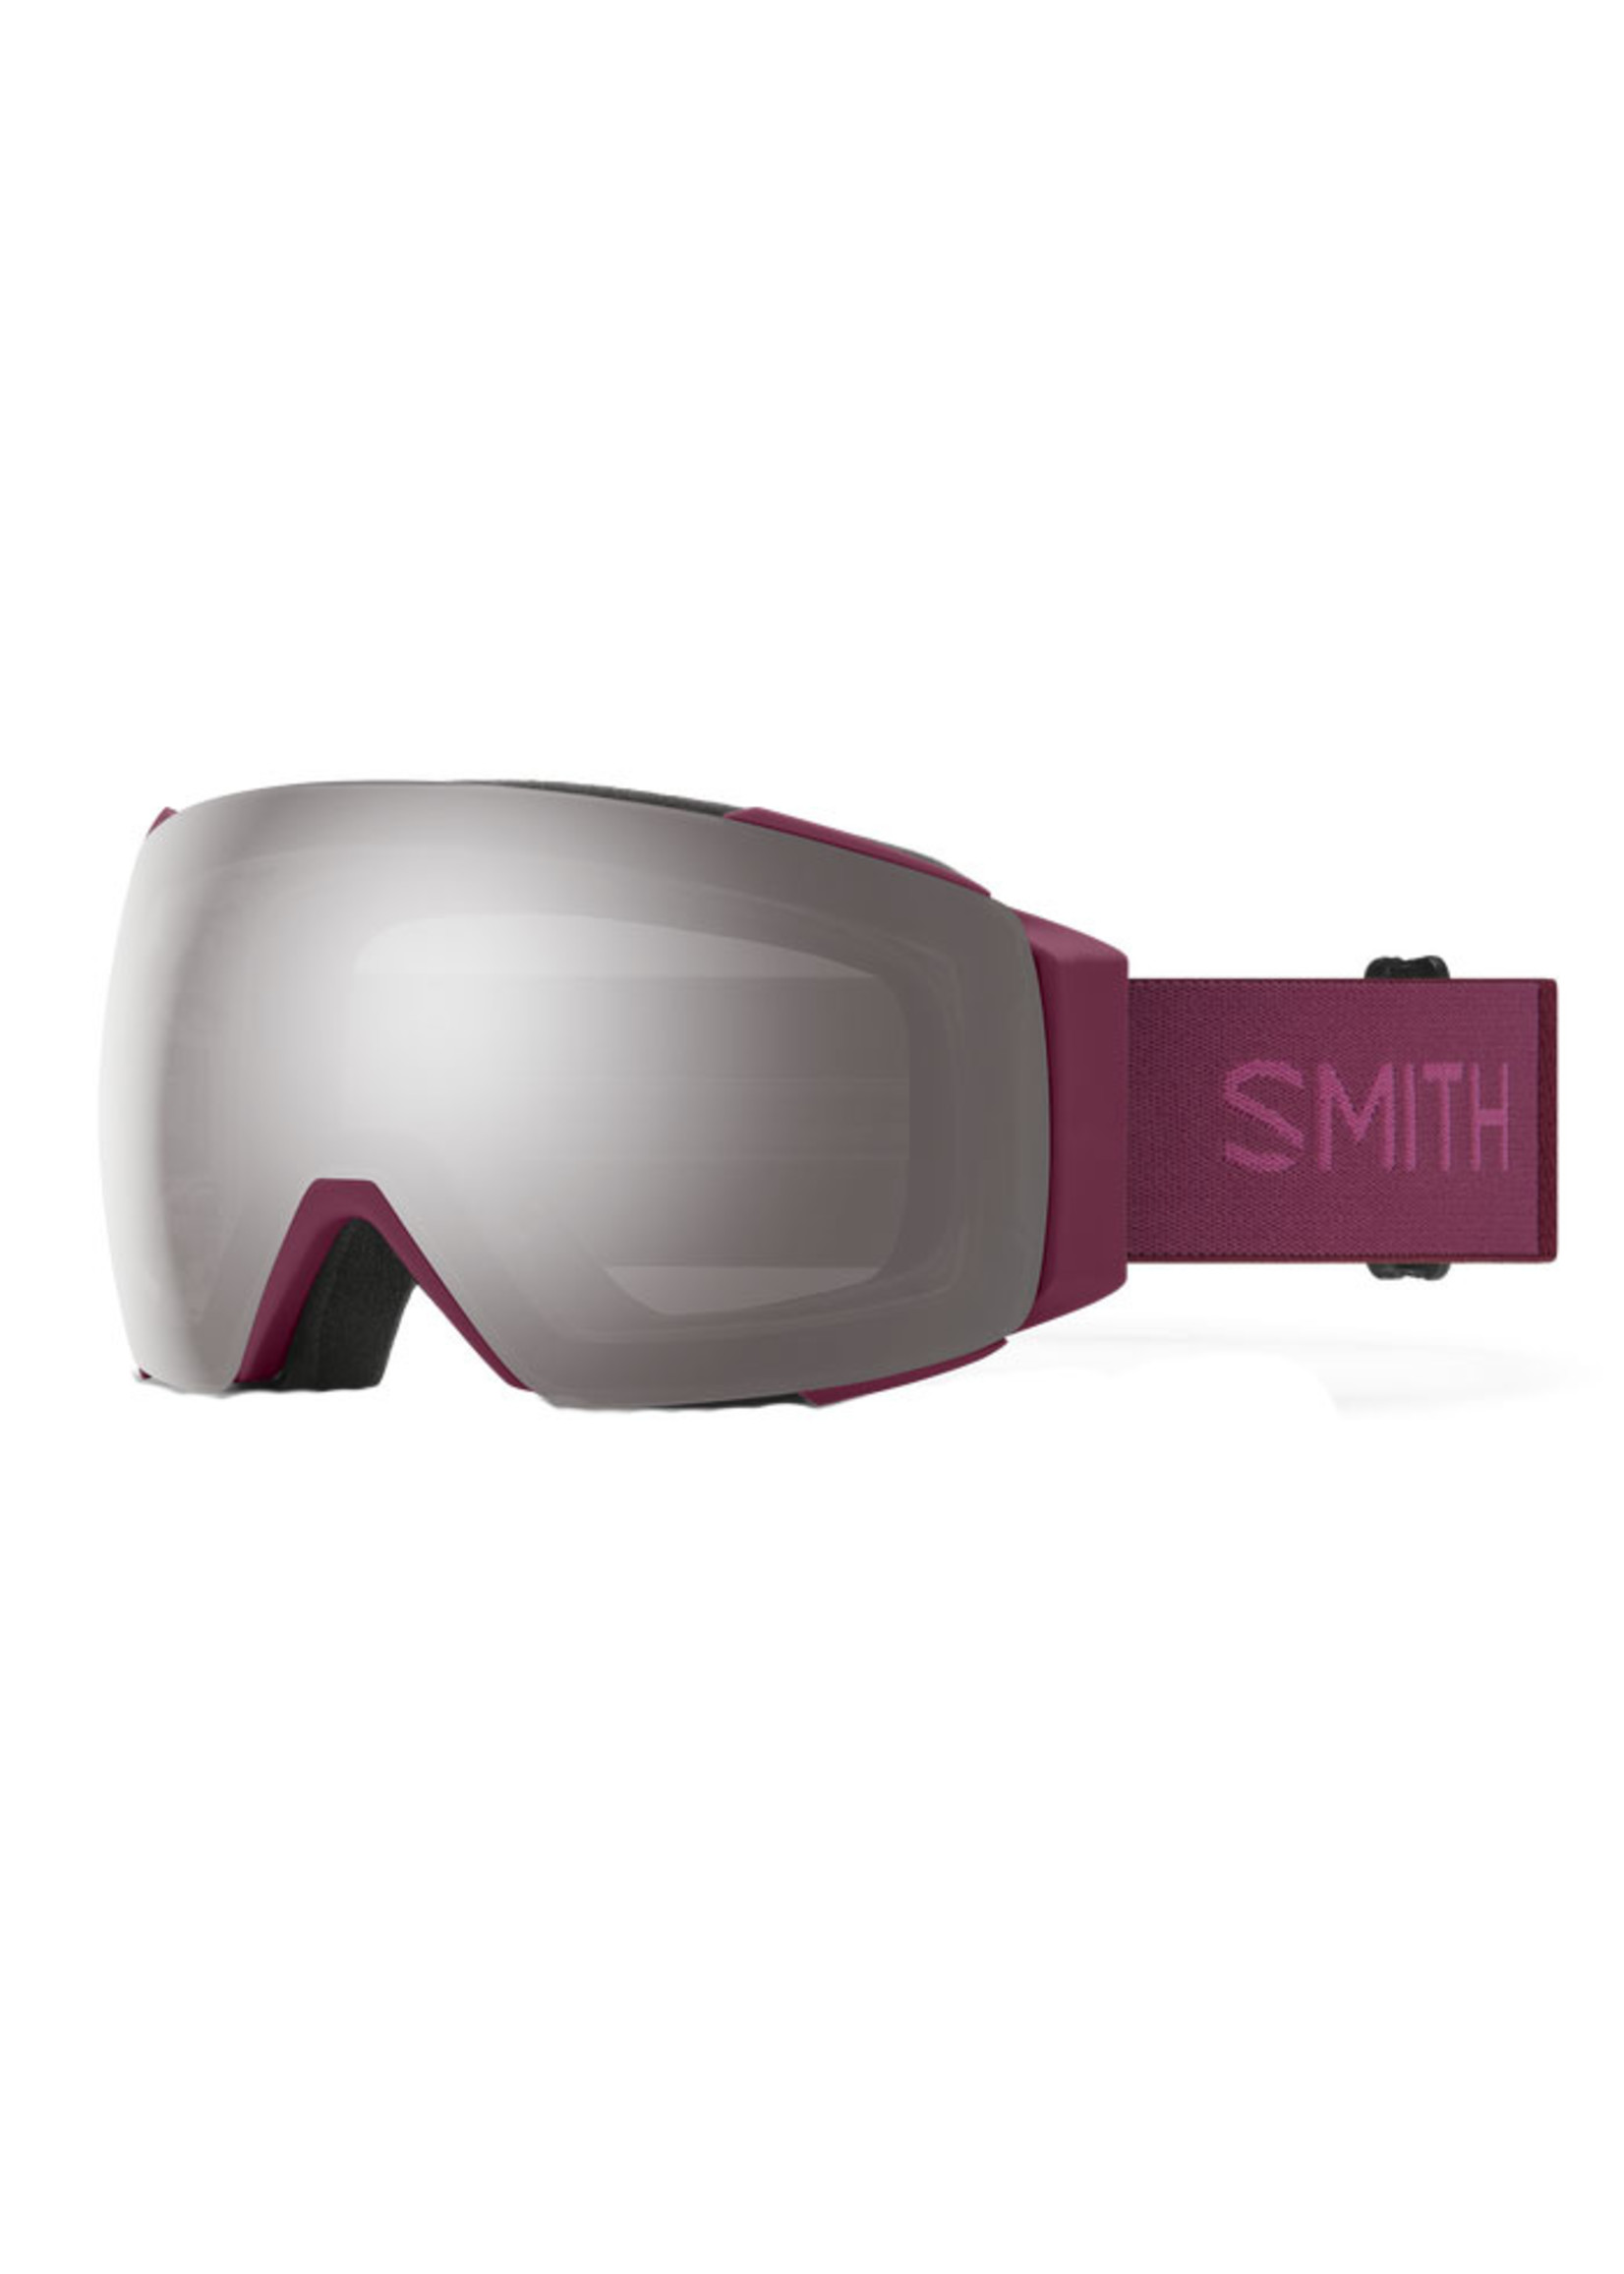 SMITH I/O MAG LUNETTE